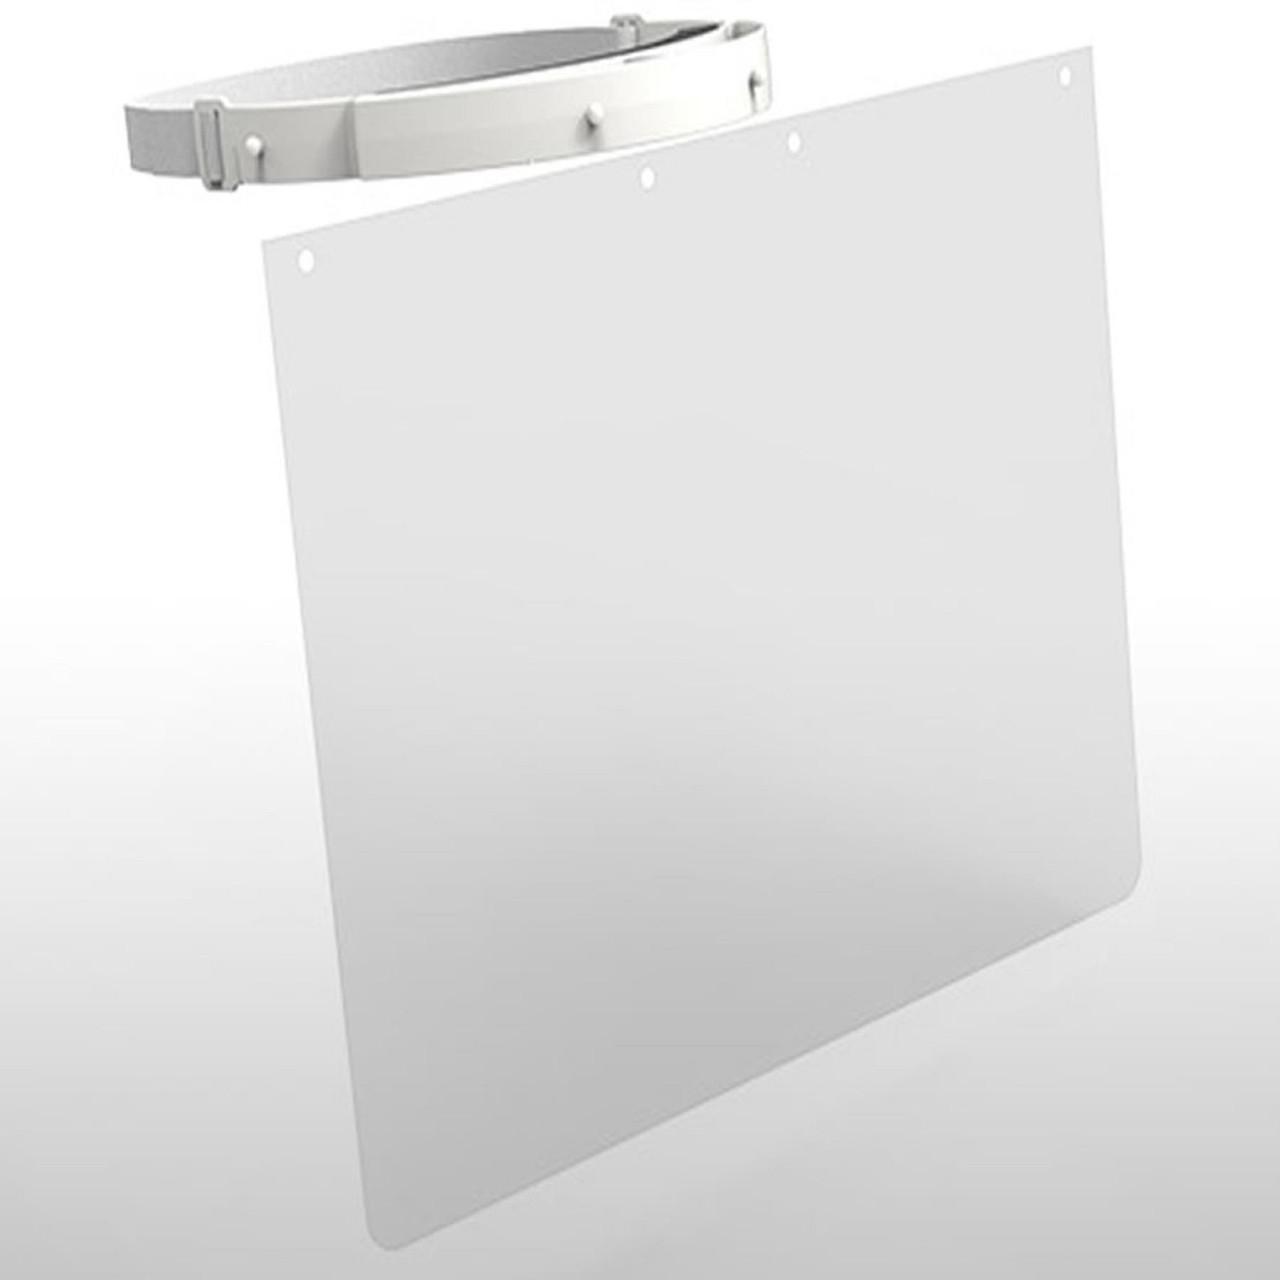 Galaxy PPE Face Shield/Visor/Mask/Guard with Reusable Headband - Anti-fog